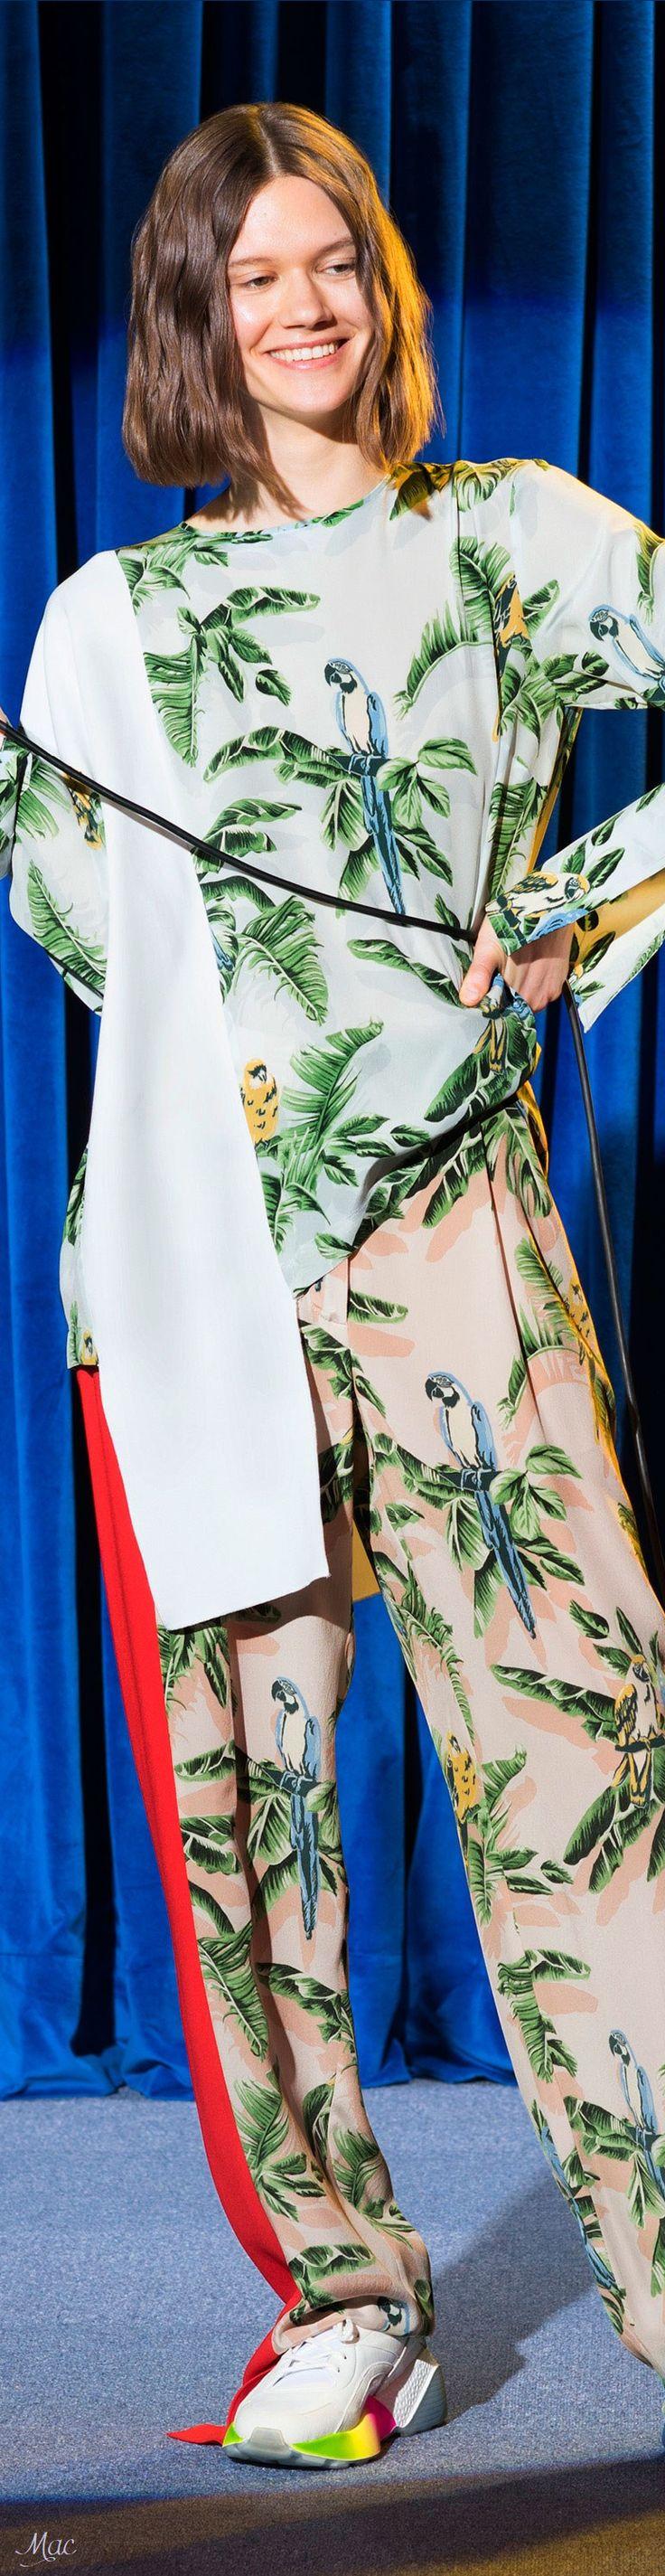 Resort 2018 Stella McCartney ✨   ᘡℓvᘠ❤ﻸ•·˙❤•·˙ﻸ❤□☆□ ❉ღ // ✧彡☀️● ⊱❊⊰✦❁ ❀ ‿ ❀ ·✳︎· ☘‿FR OCT 06 2017‿☘ ✨ ✤ ॐ ♕ ♚ εїз ⚜ ✧❦♥⭐♢❃ ♦•● ♡●•❊☘ нανє α ηι¢є ∂αу ☘❊ ღ 彡✦ ❁ ༺✿༻✨ ♥ ♫ ~*~♆❤ ✨ gυяυ ✤ॐ ✧⚜✧ ☽☾♪♕✫ ❁ ✦●❁↠ ஜℓvஜ